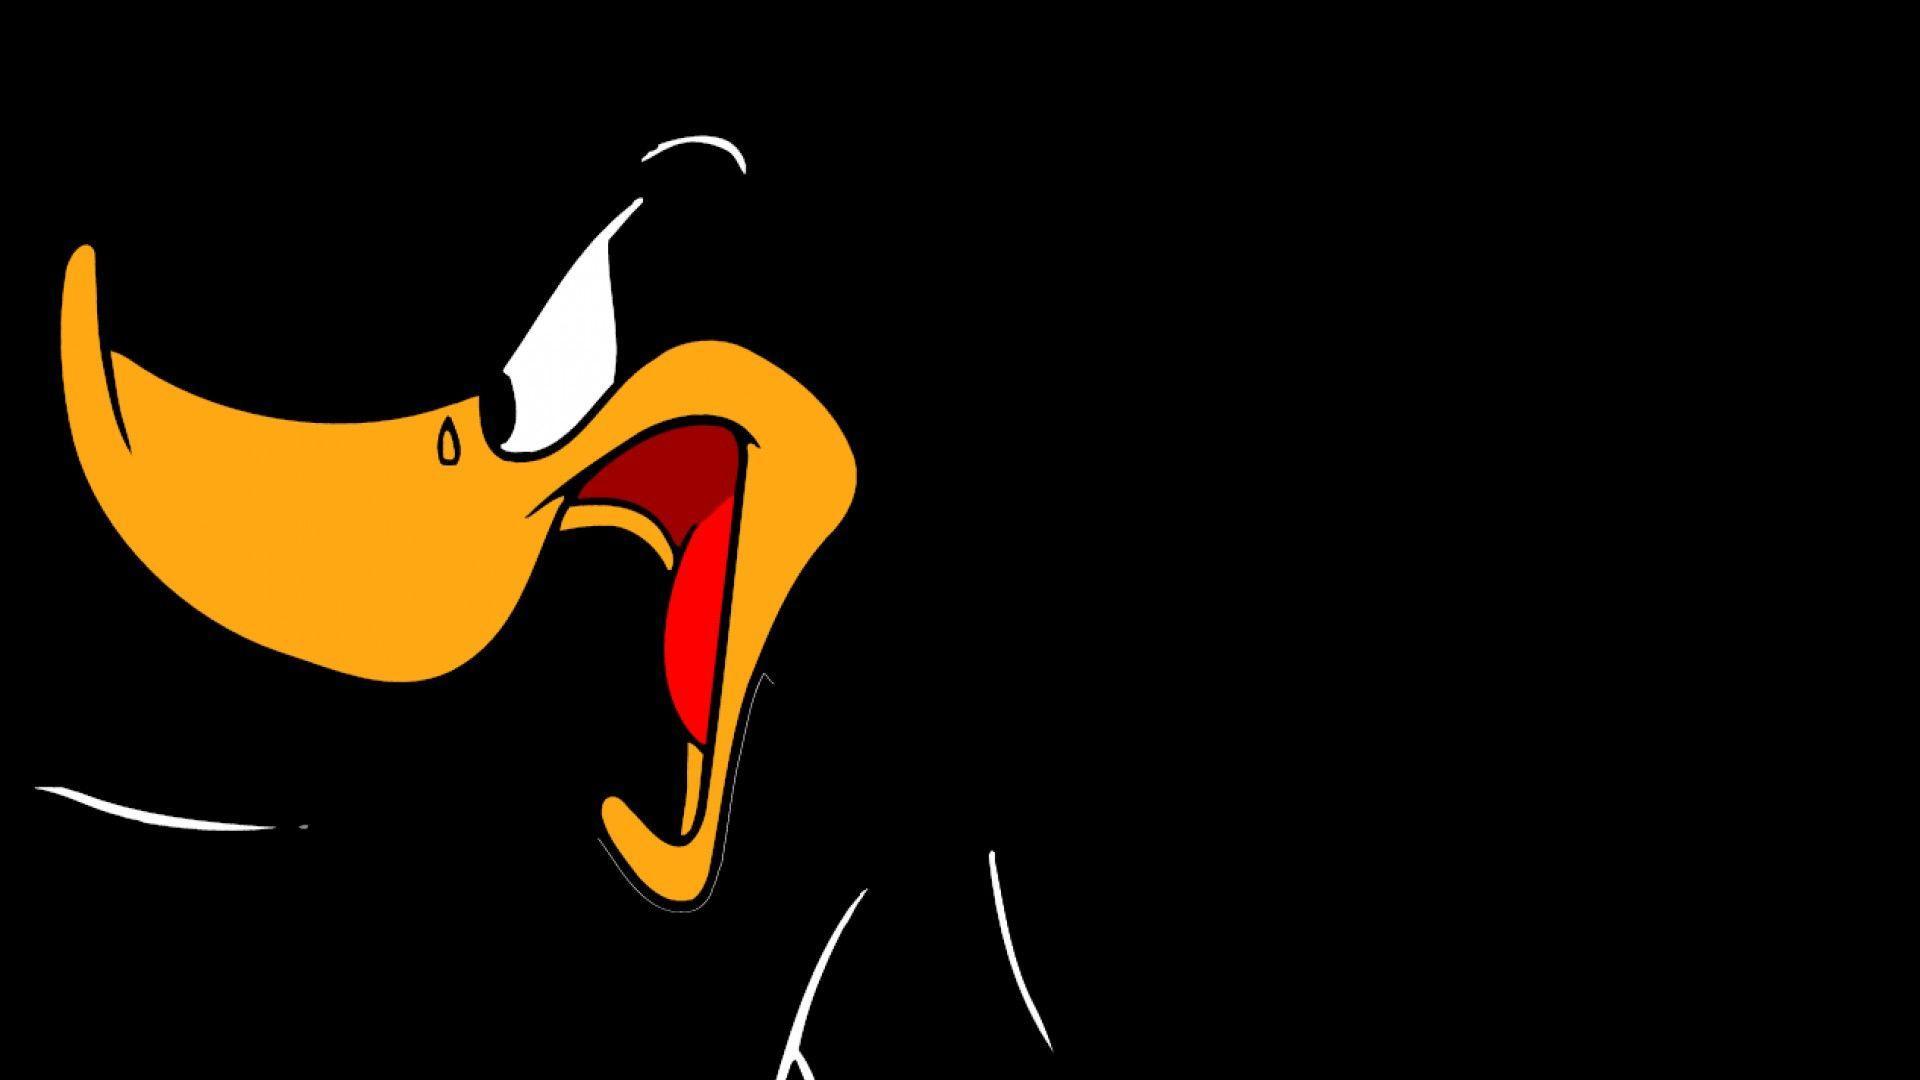 Daffy duck wallpapers wallpaper cave - Donald duck wallpapers for desktop ...